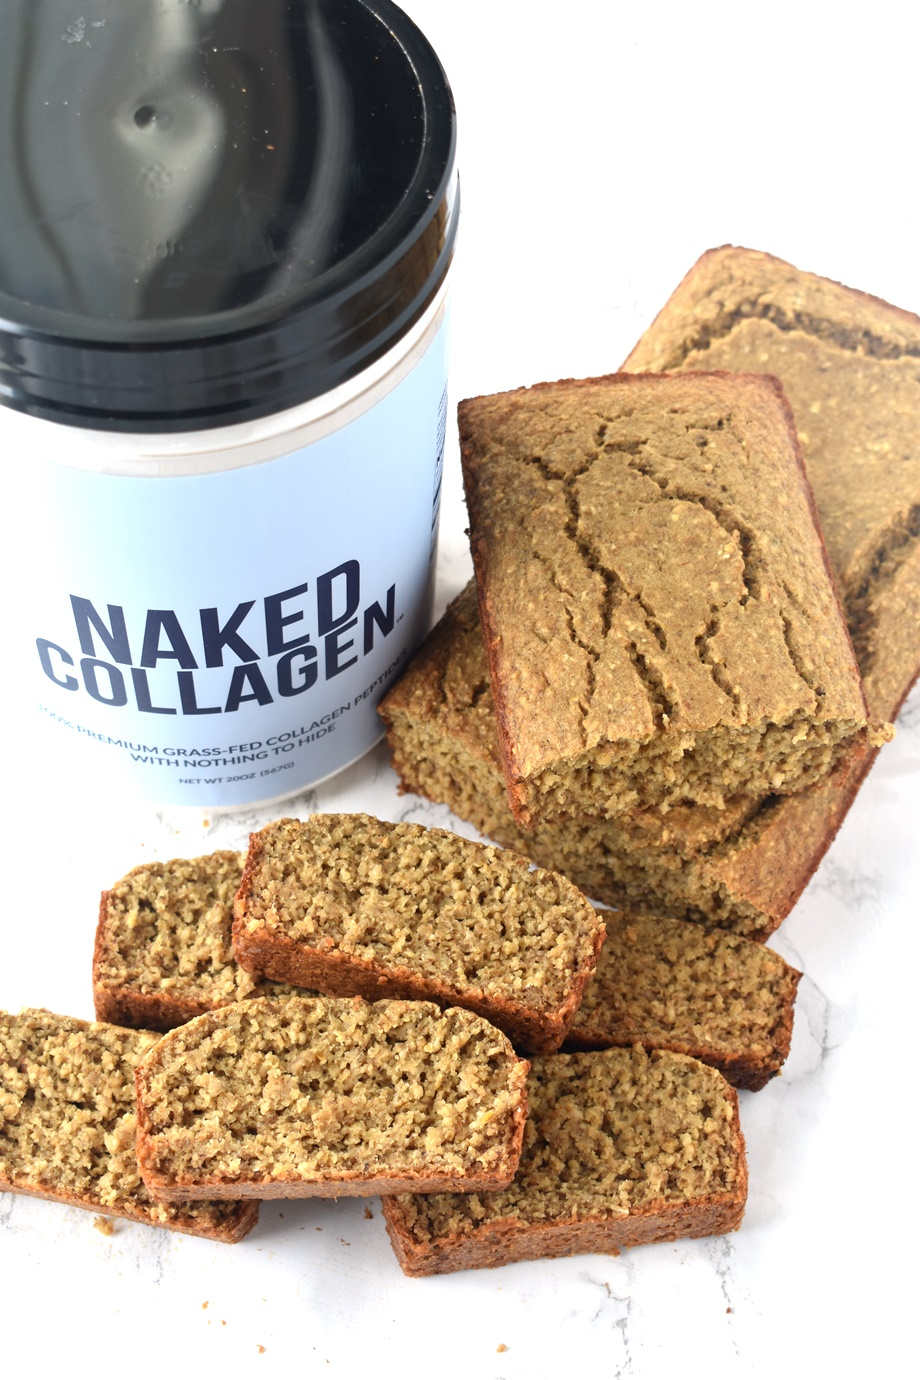 Naked Nutrition Collagen Banana Bread